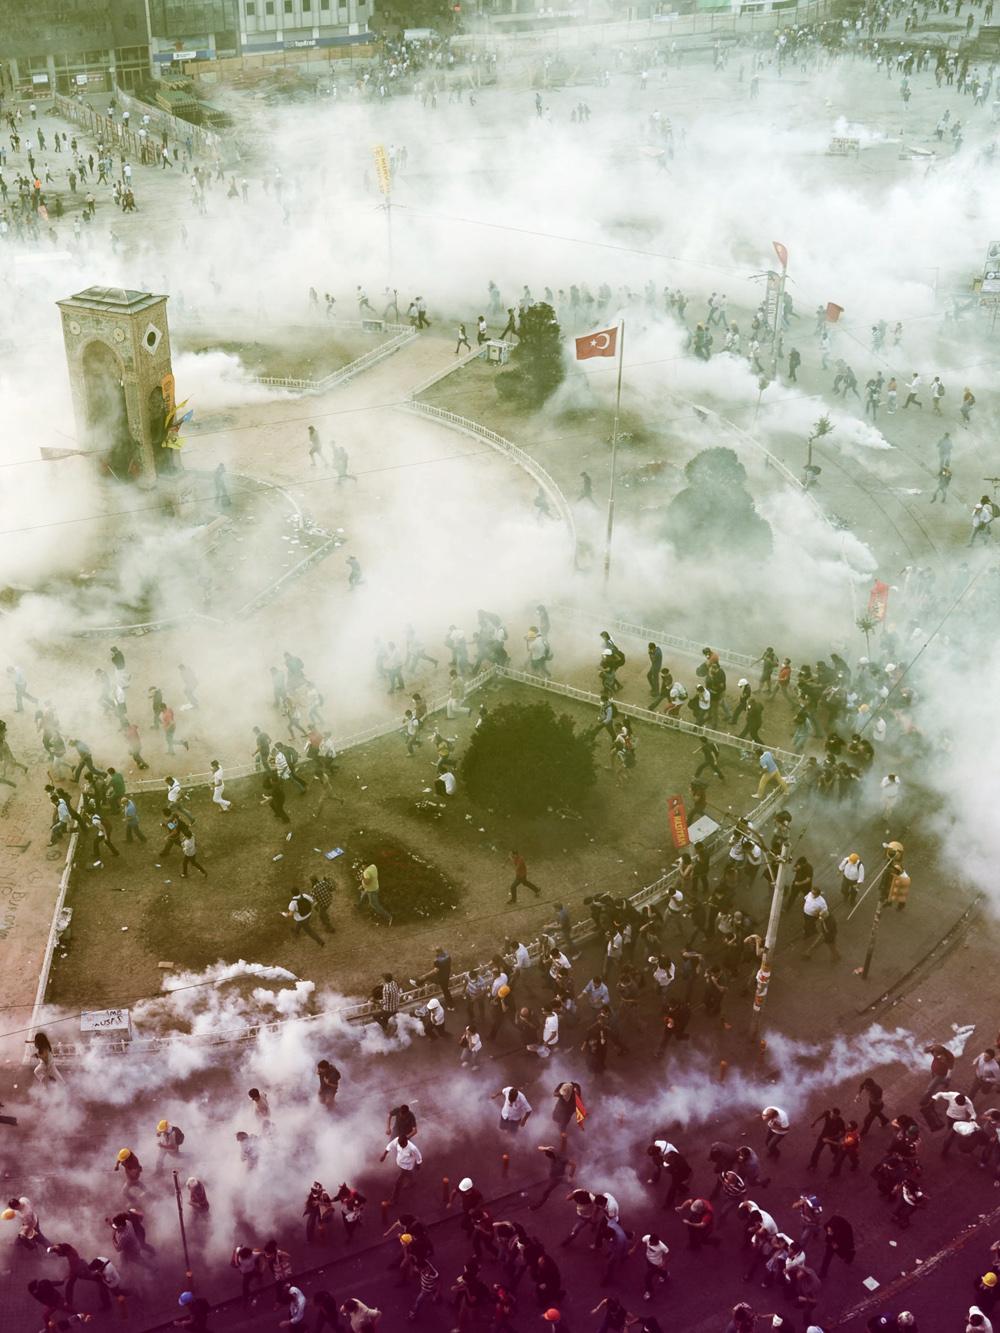 Gezi Park Protests, Istanbul